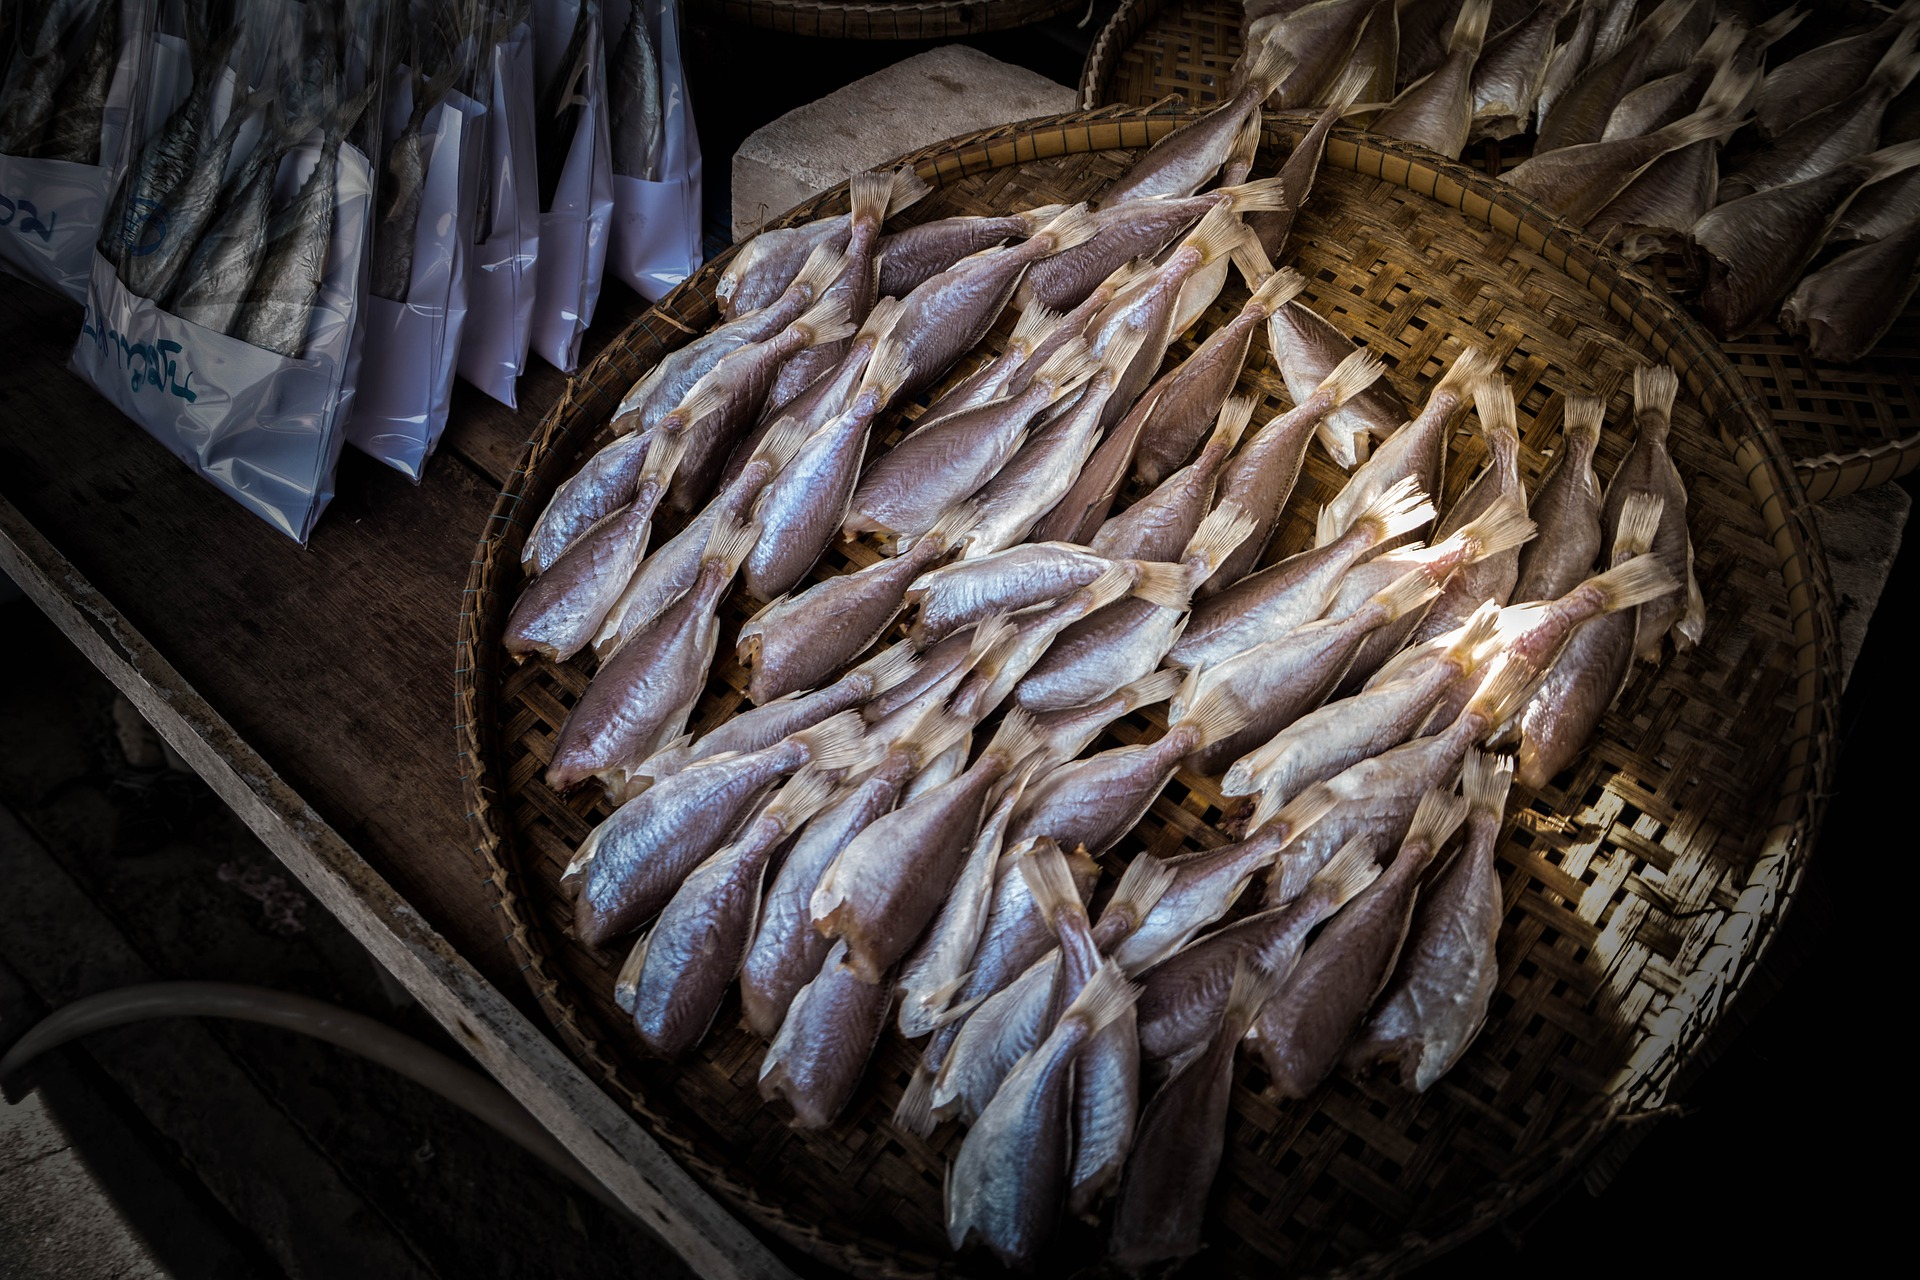 fish privoz market odessa ukraine